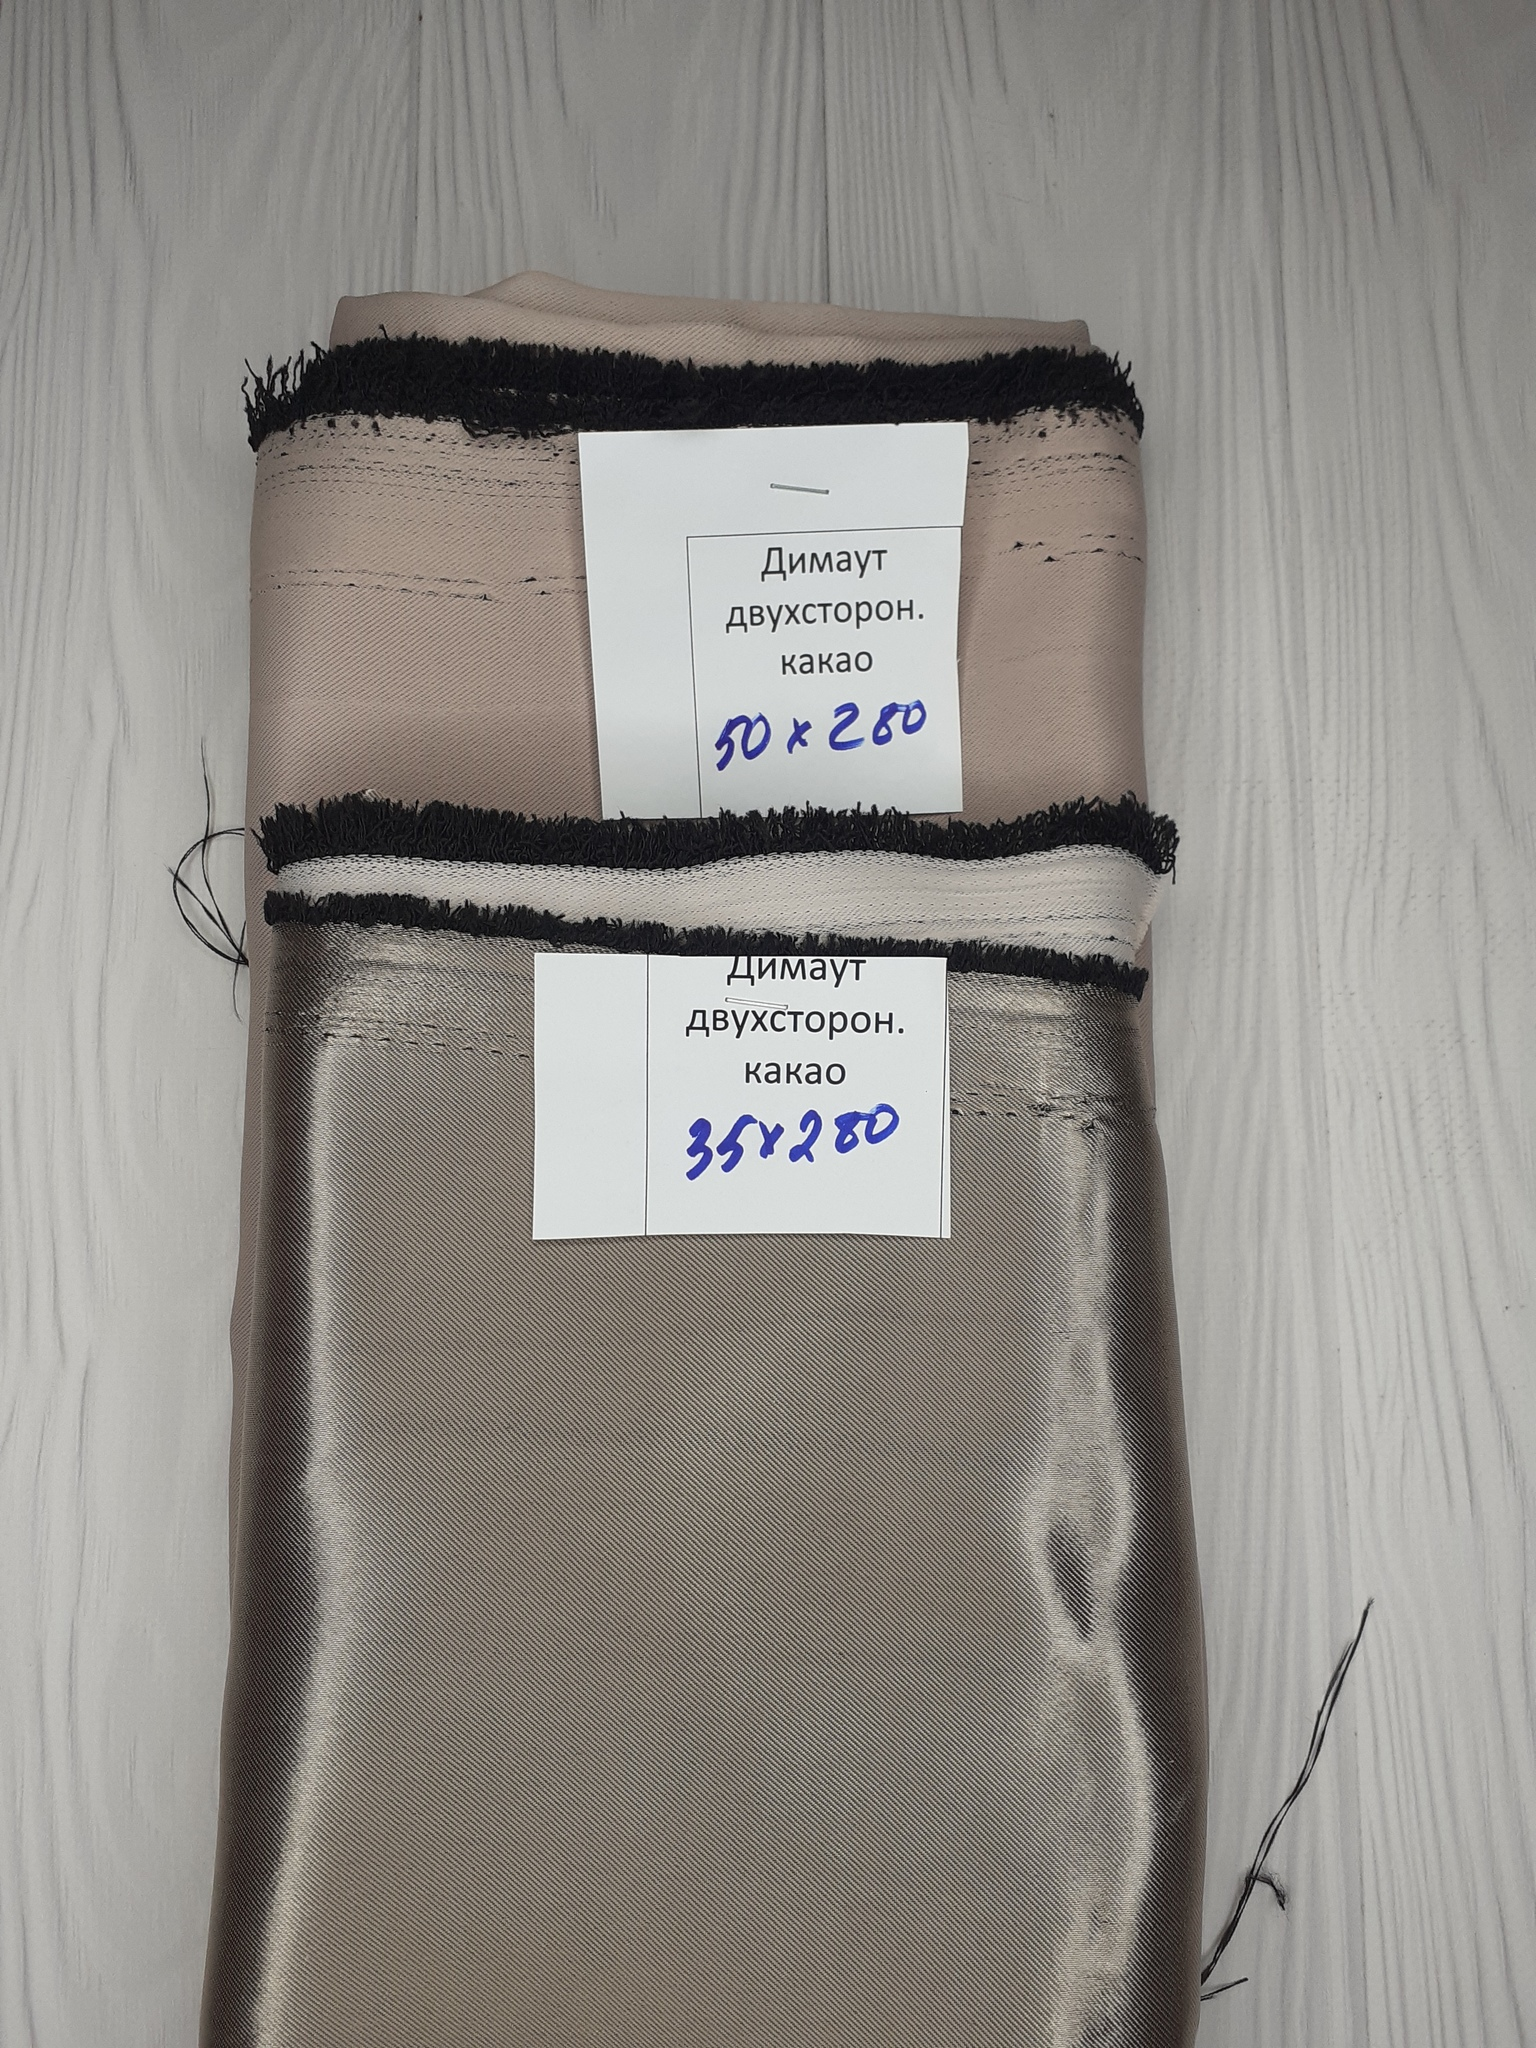 Димаут двухсторонний какао (лоскут)